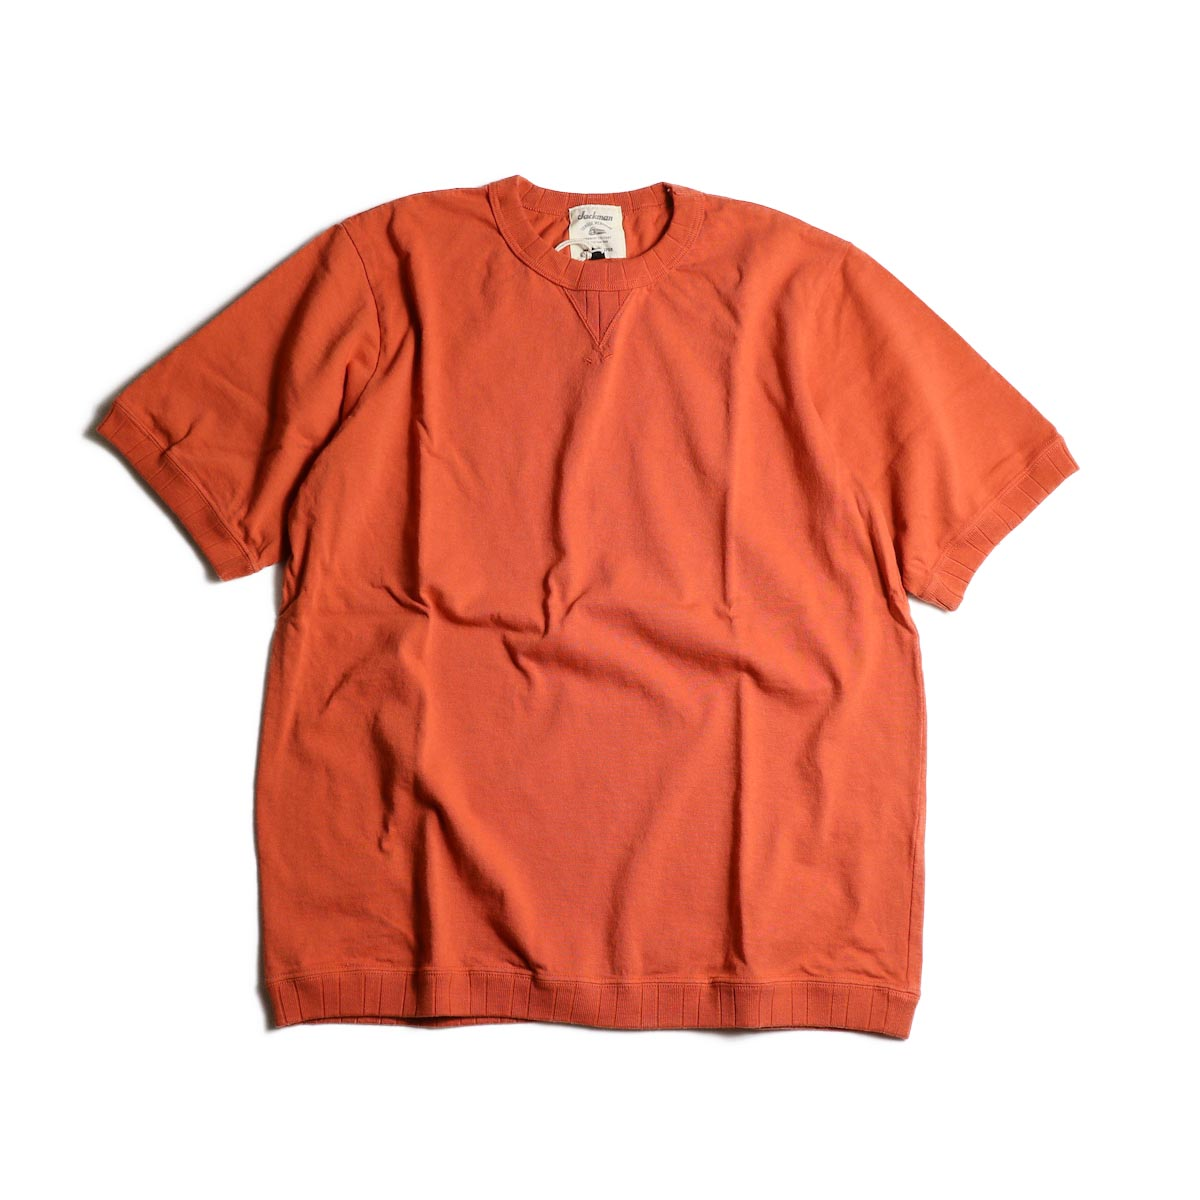 Jackman / Rib T-Shirt (Sunset Orange)